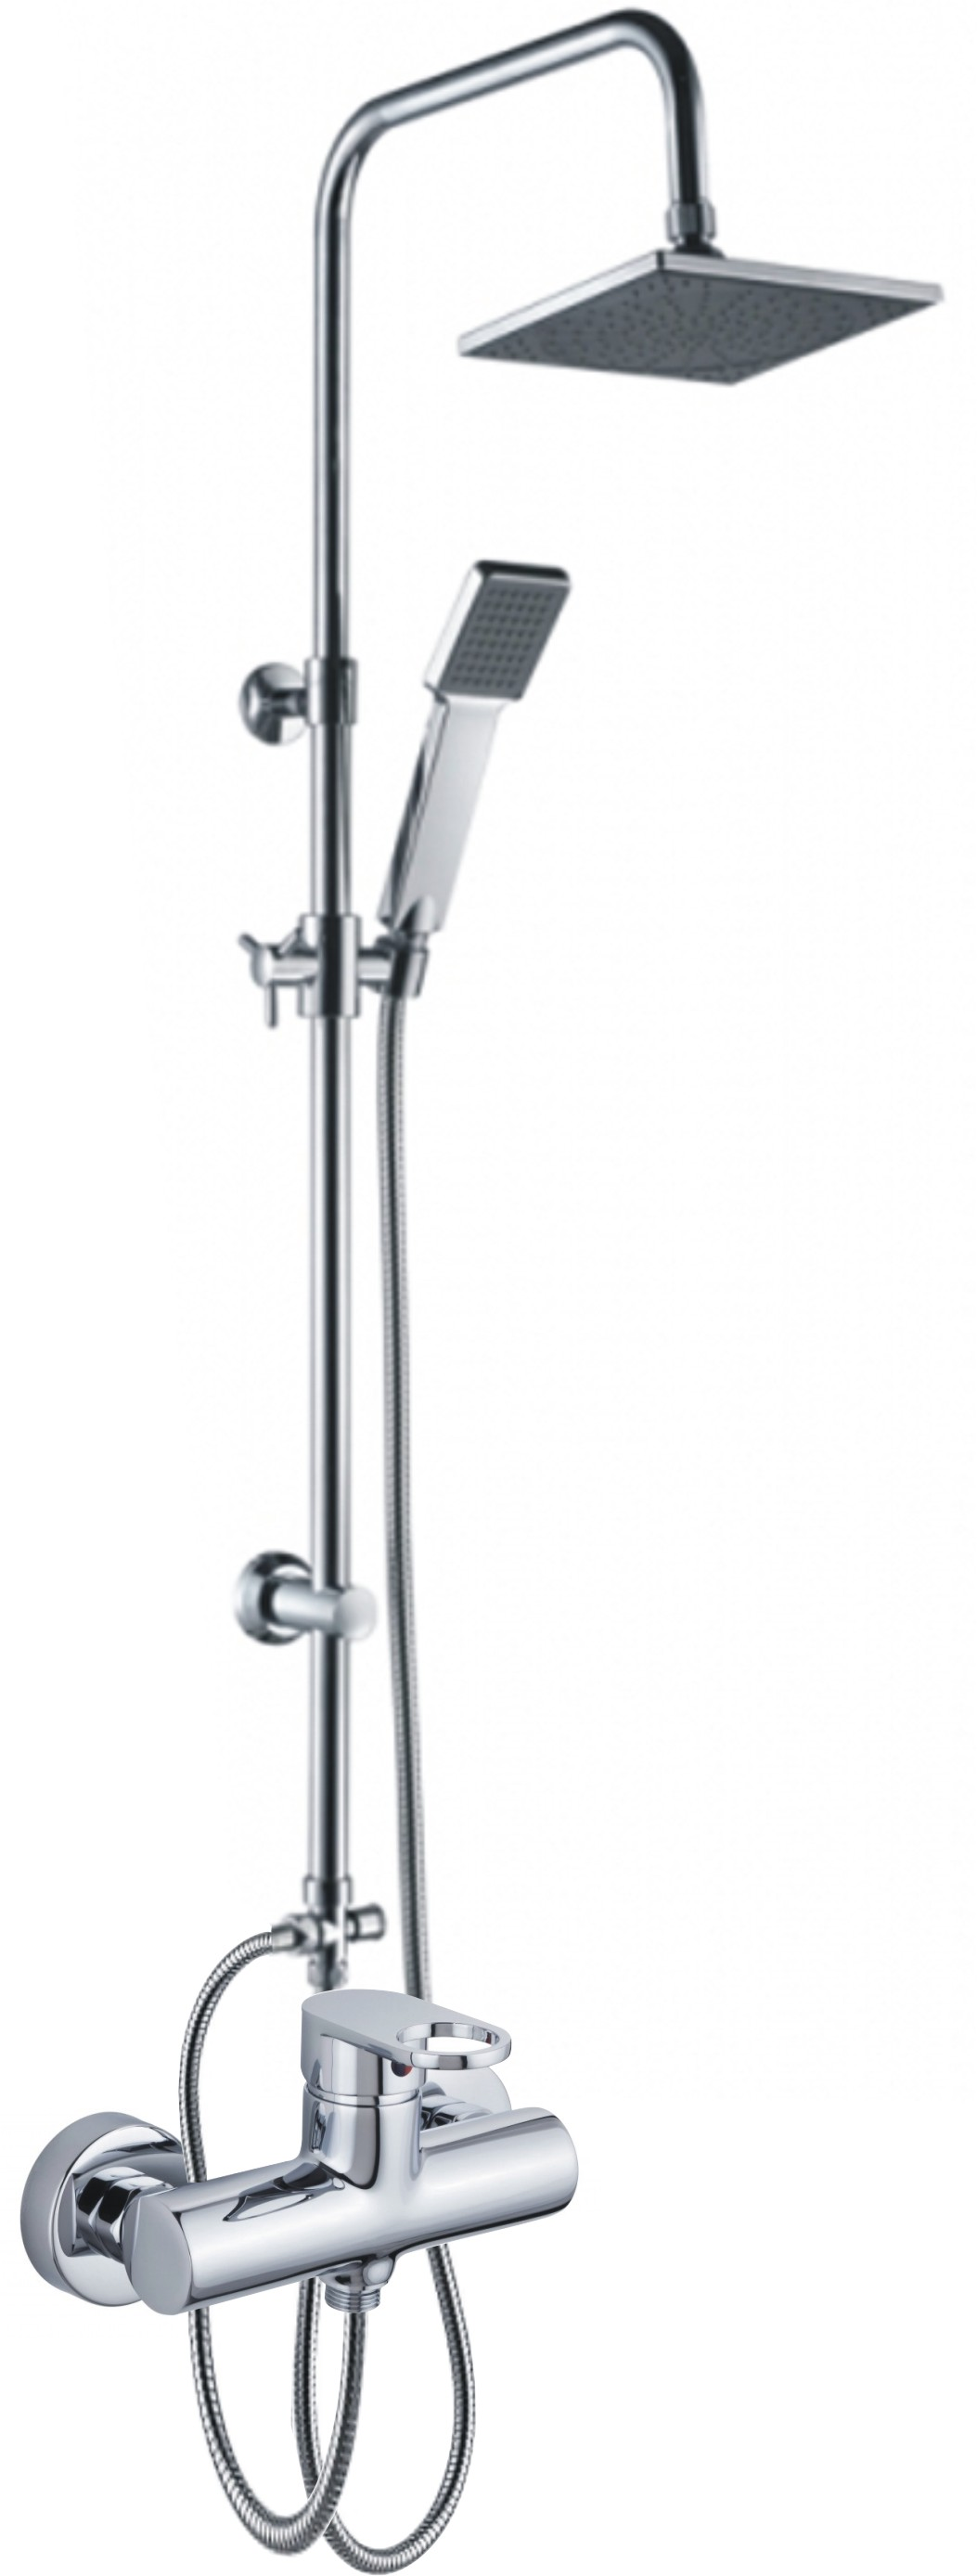 RELAX WALZE Well Sprchový set se sprchovou baterií, skladem